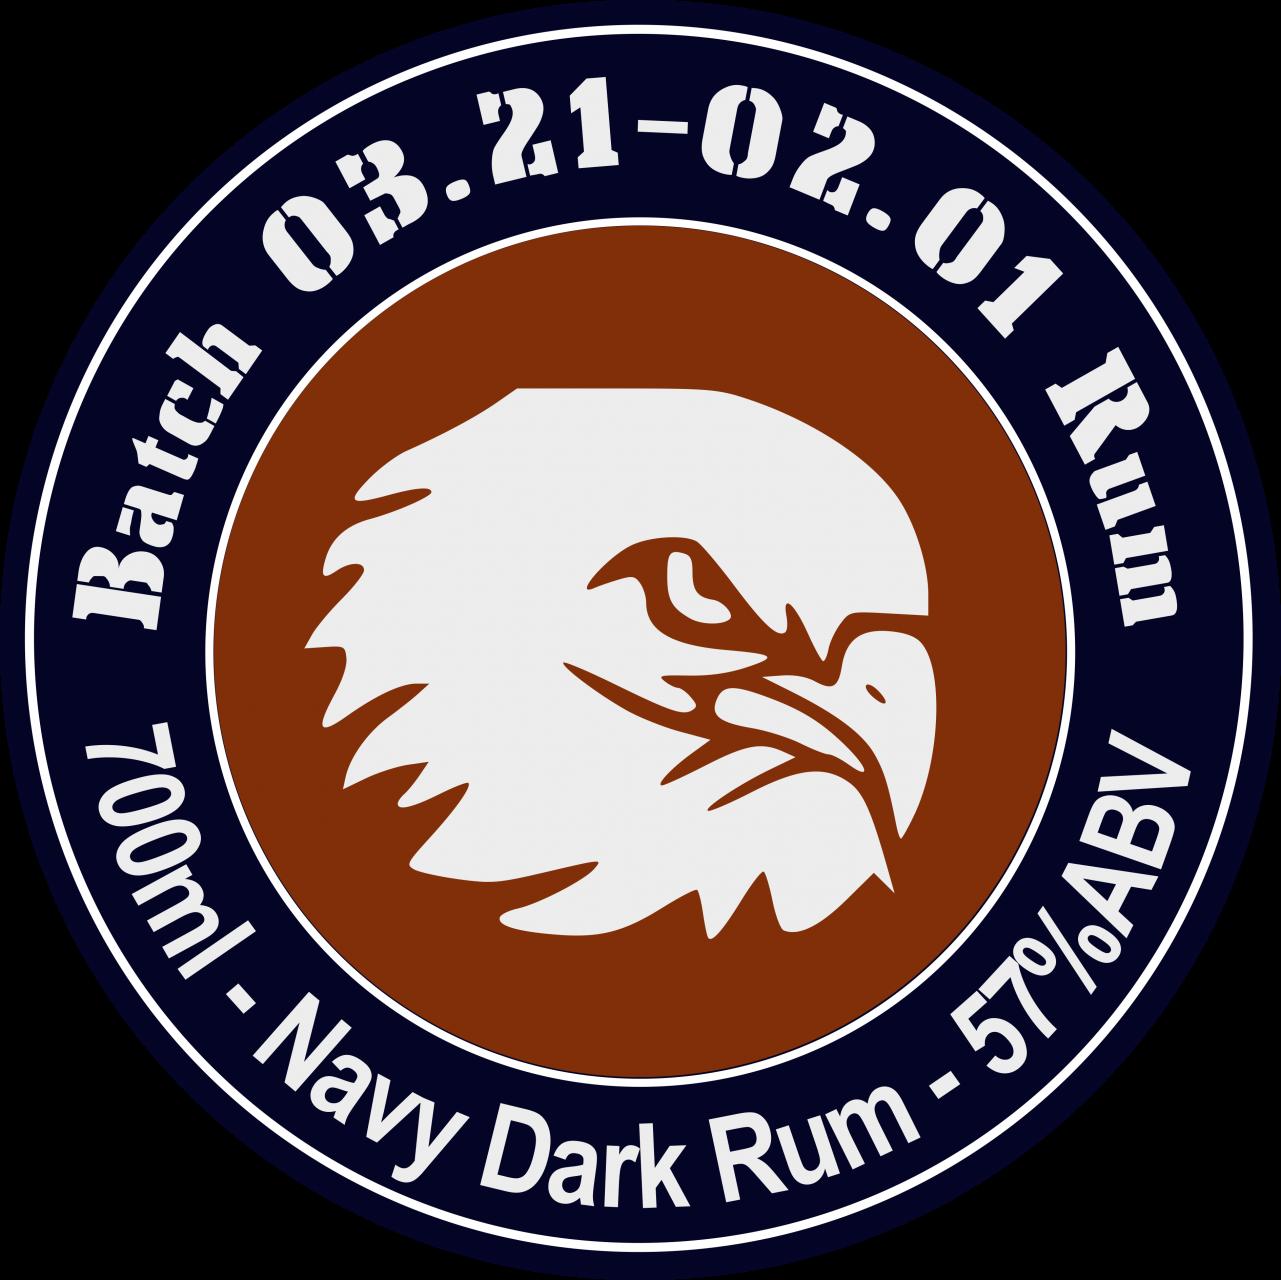 Batch 03.21 - 01.01 Rum